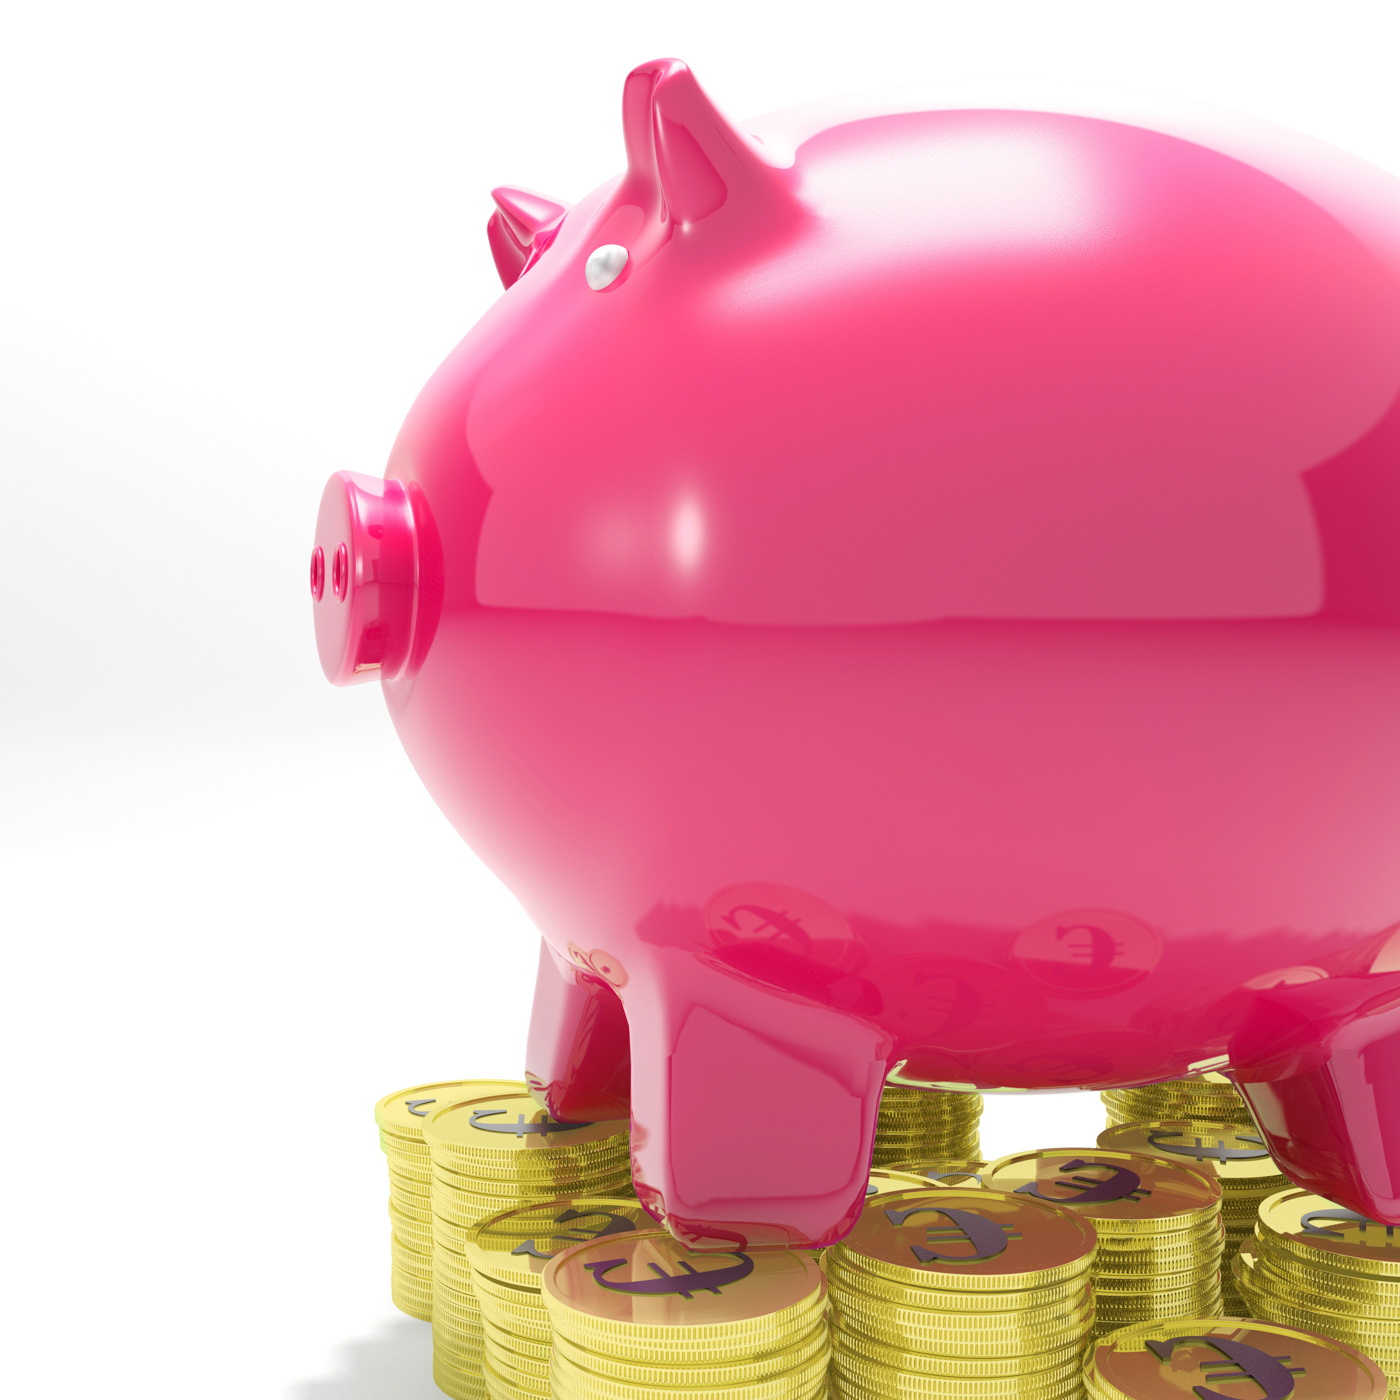 Piggybank on coins showing monetary increase photo